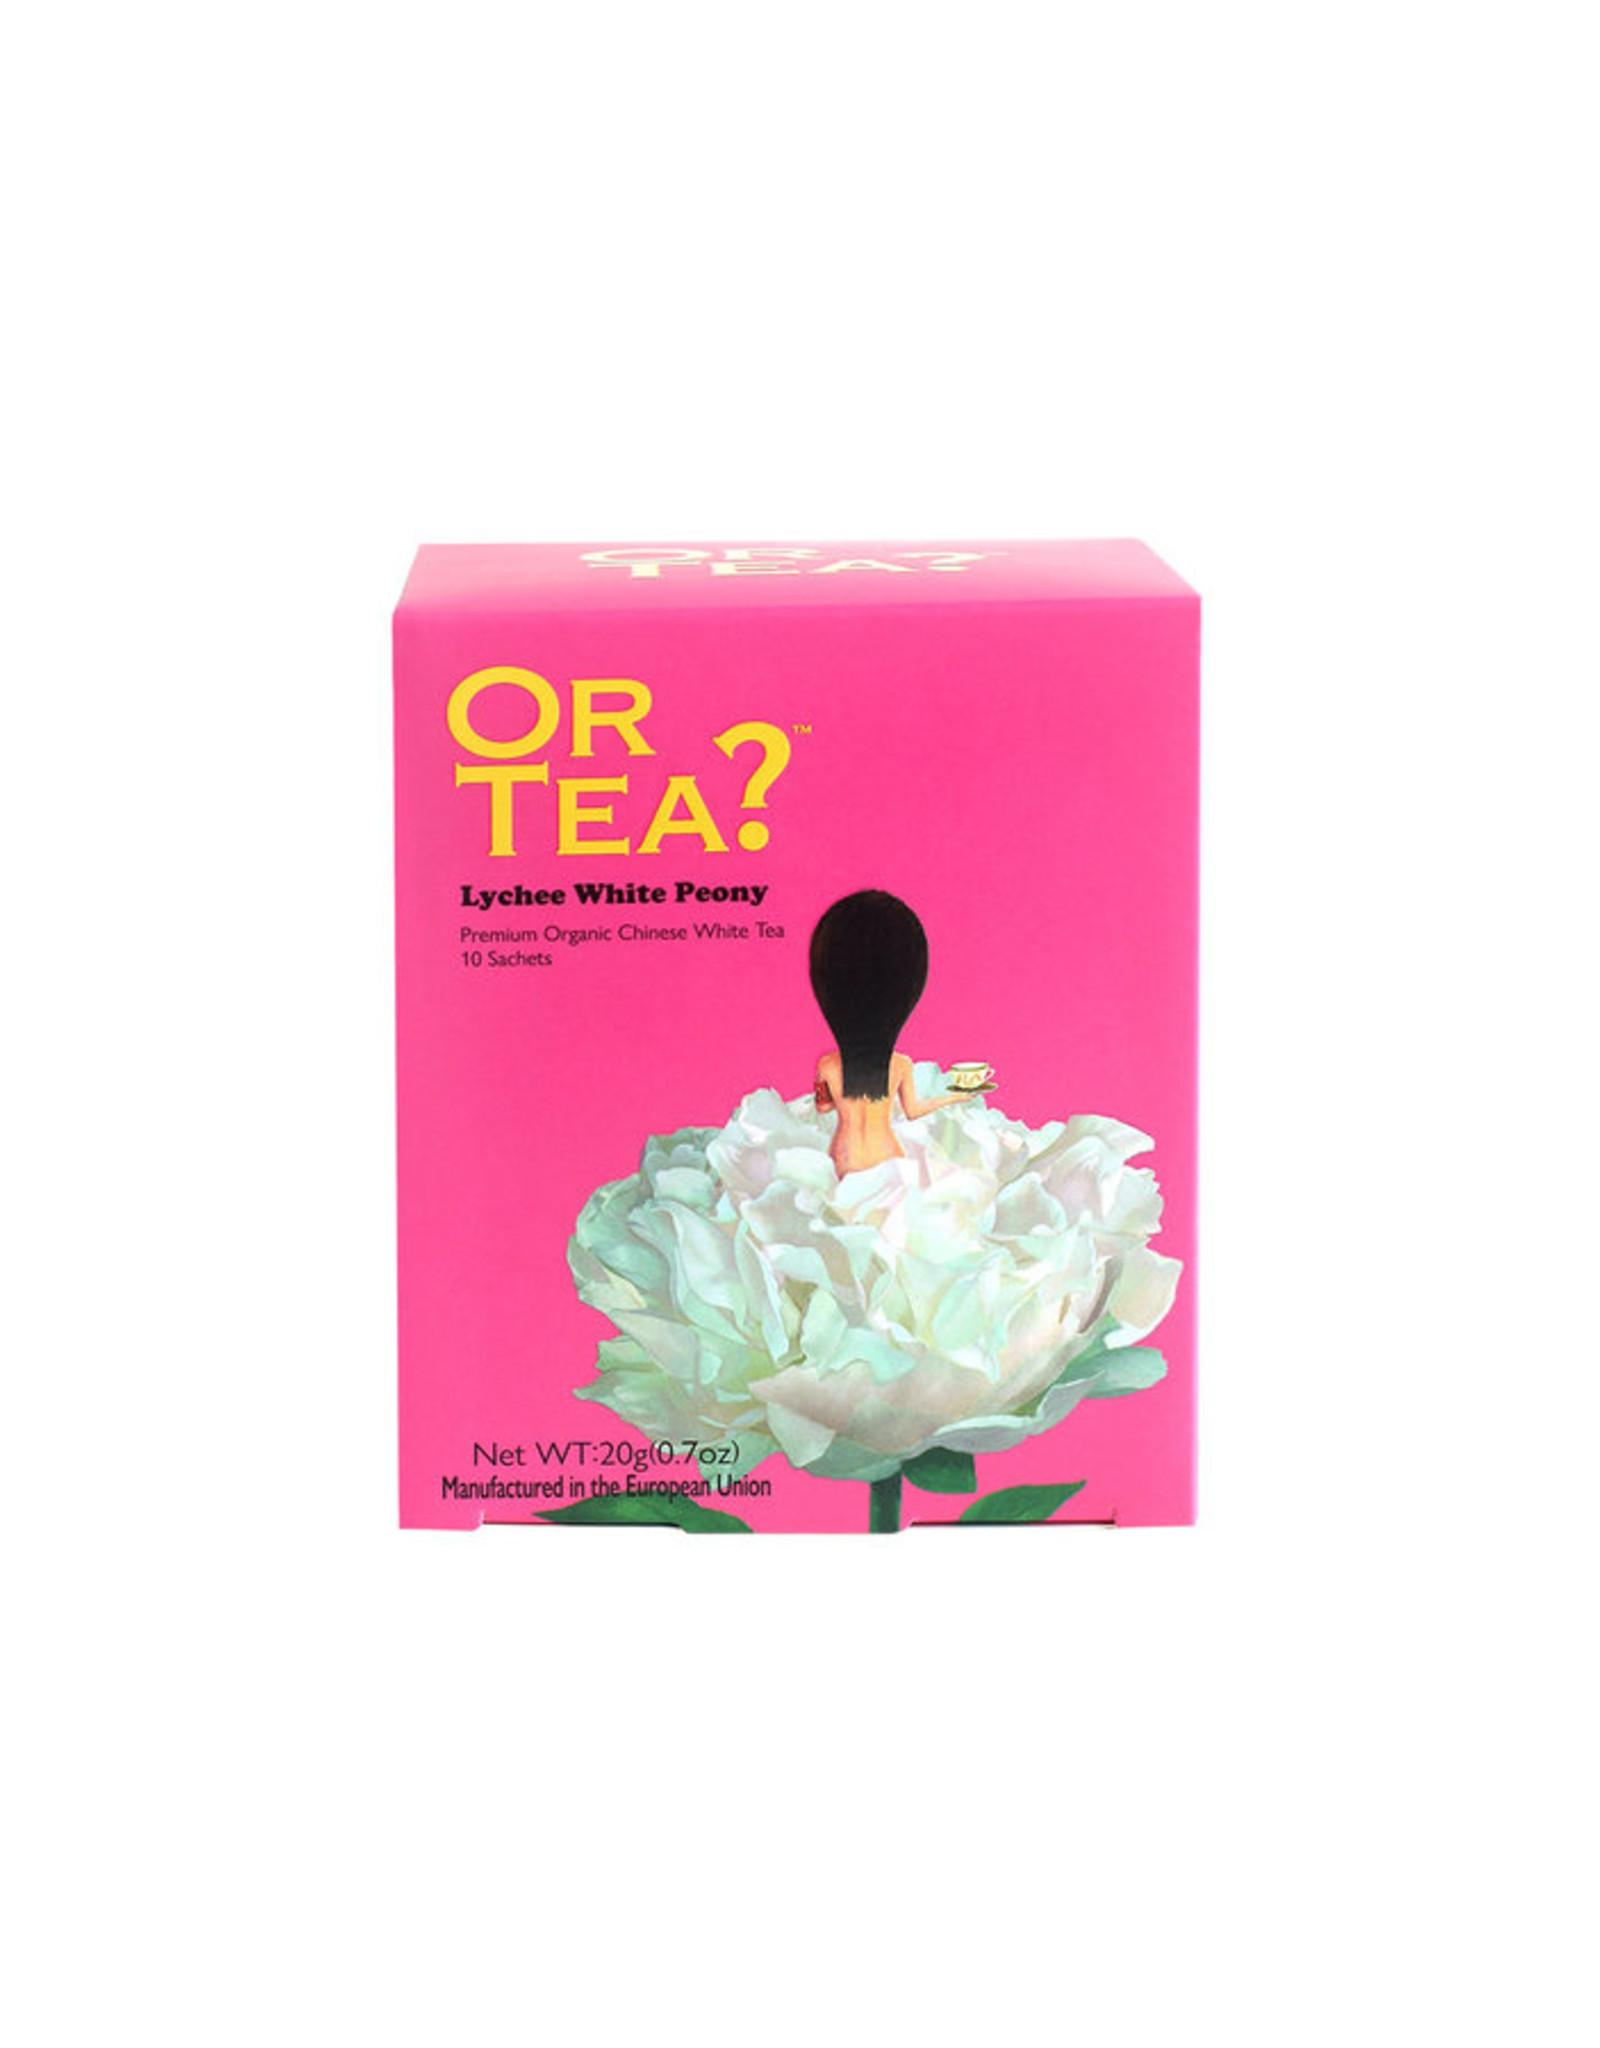 Or Tea? Organic Lychee White Peony - 10-Sachet Box (Pillow)